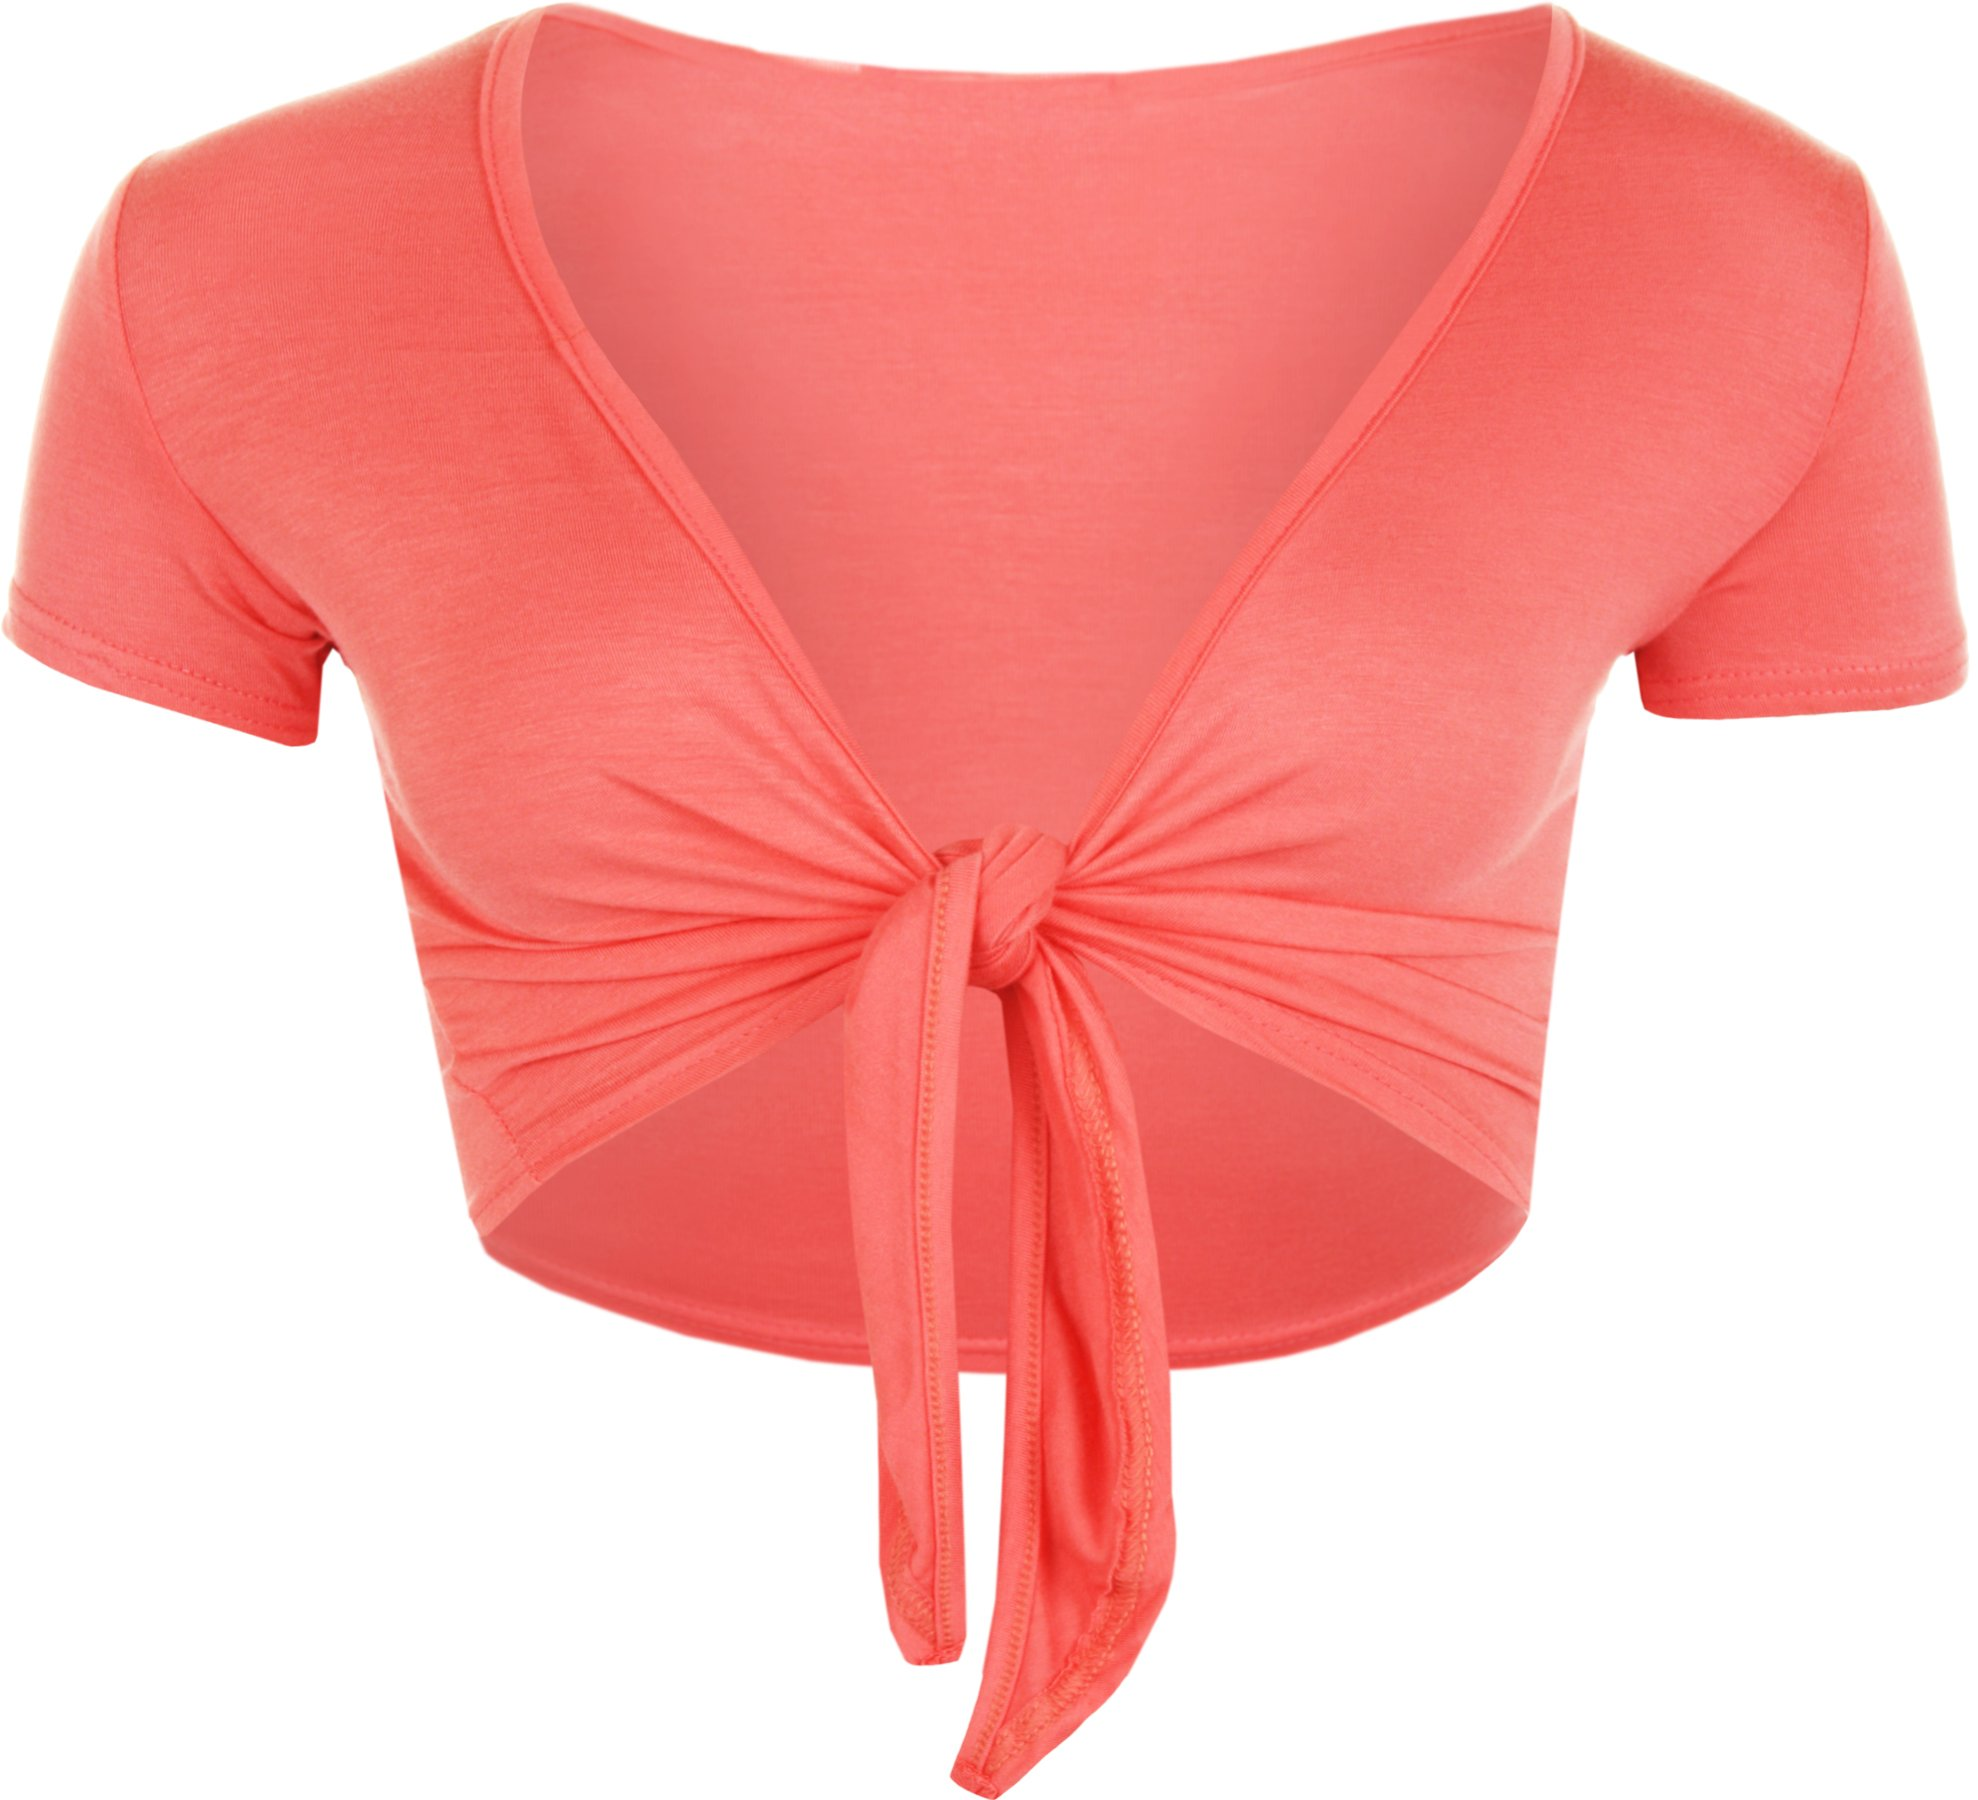 WearAll Women's Tie Up Ladies Short Sleeve Stretch Open Top - Coral - US 8-10 (UK 12-14)